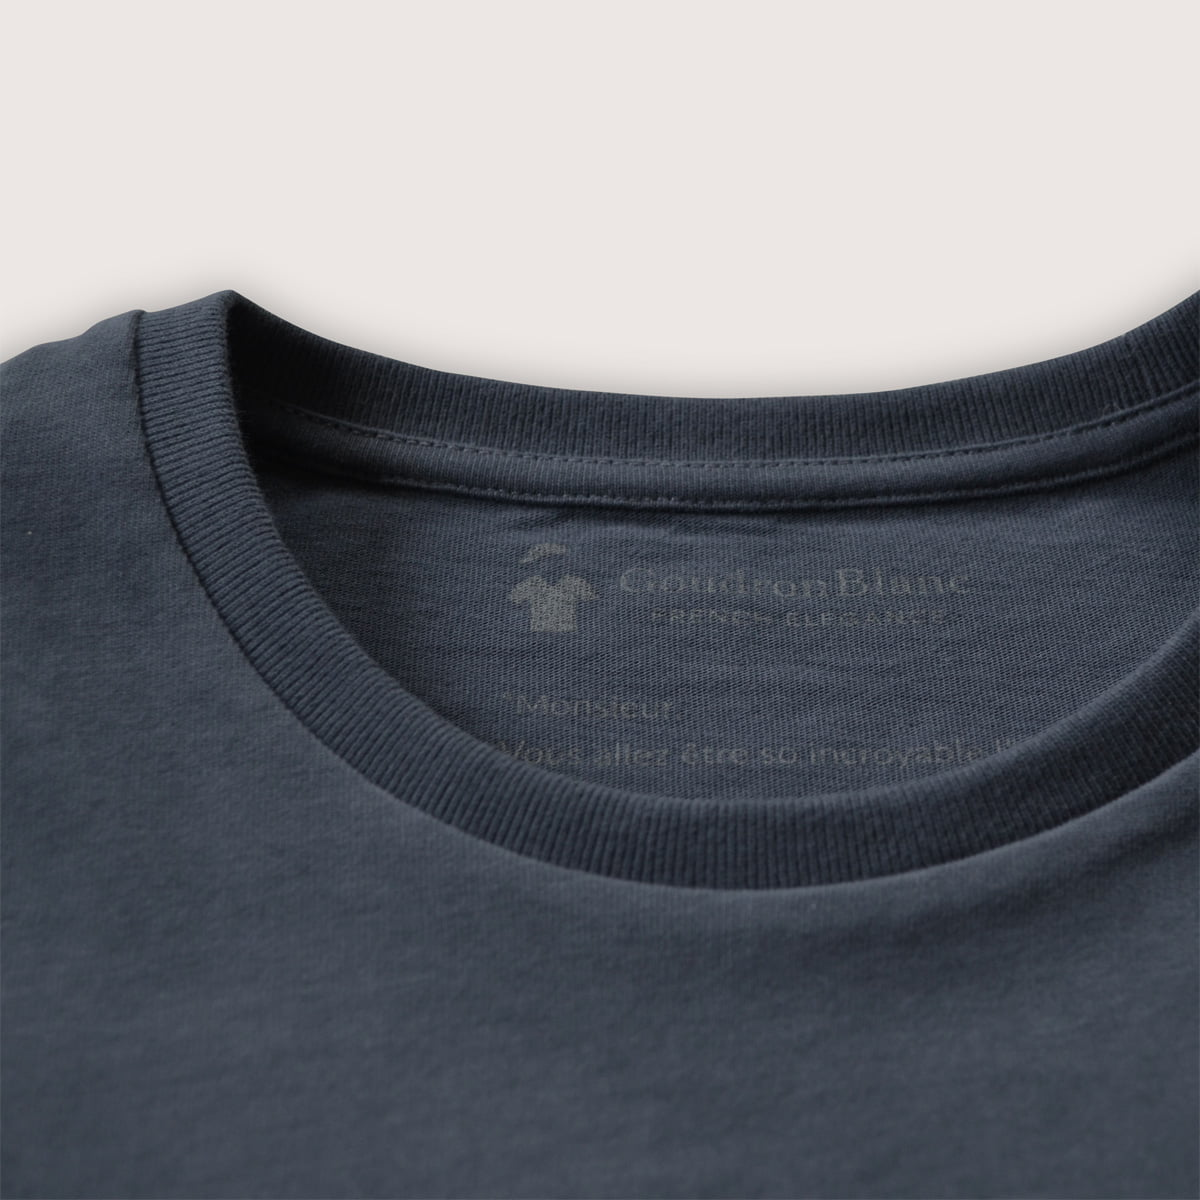 e7a938fad Long sleeve T-shirt for Men - High quality - GoudronBlanc